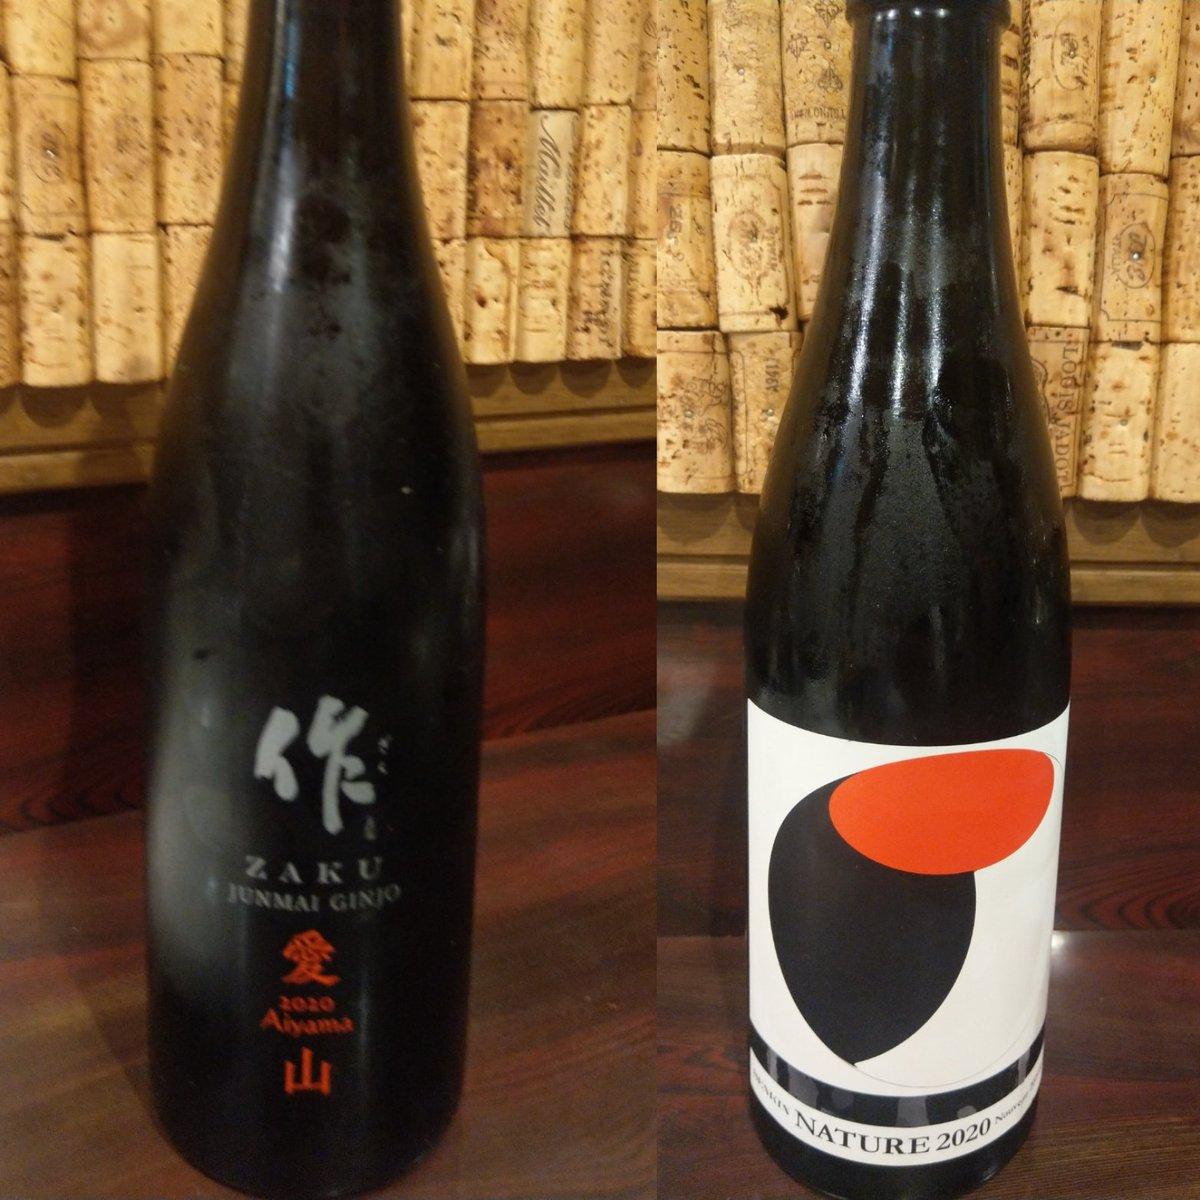 test ツイッターメディア - 今日飲んだ日本酒  写楽頼んだら仙禽でてきた(笑) https://t.co/j5PuQuTzxo